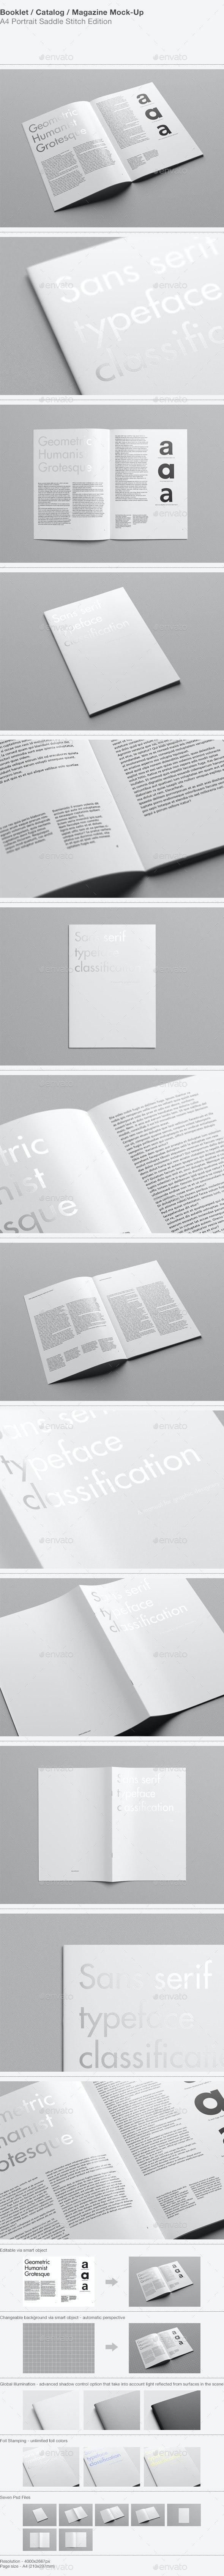 A4 Portrait Catalog / Magazine Mock-Up - Magazines Print